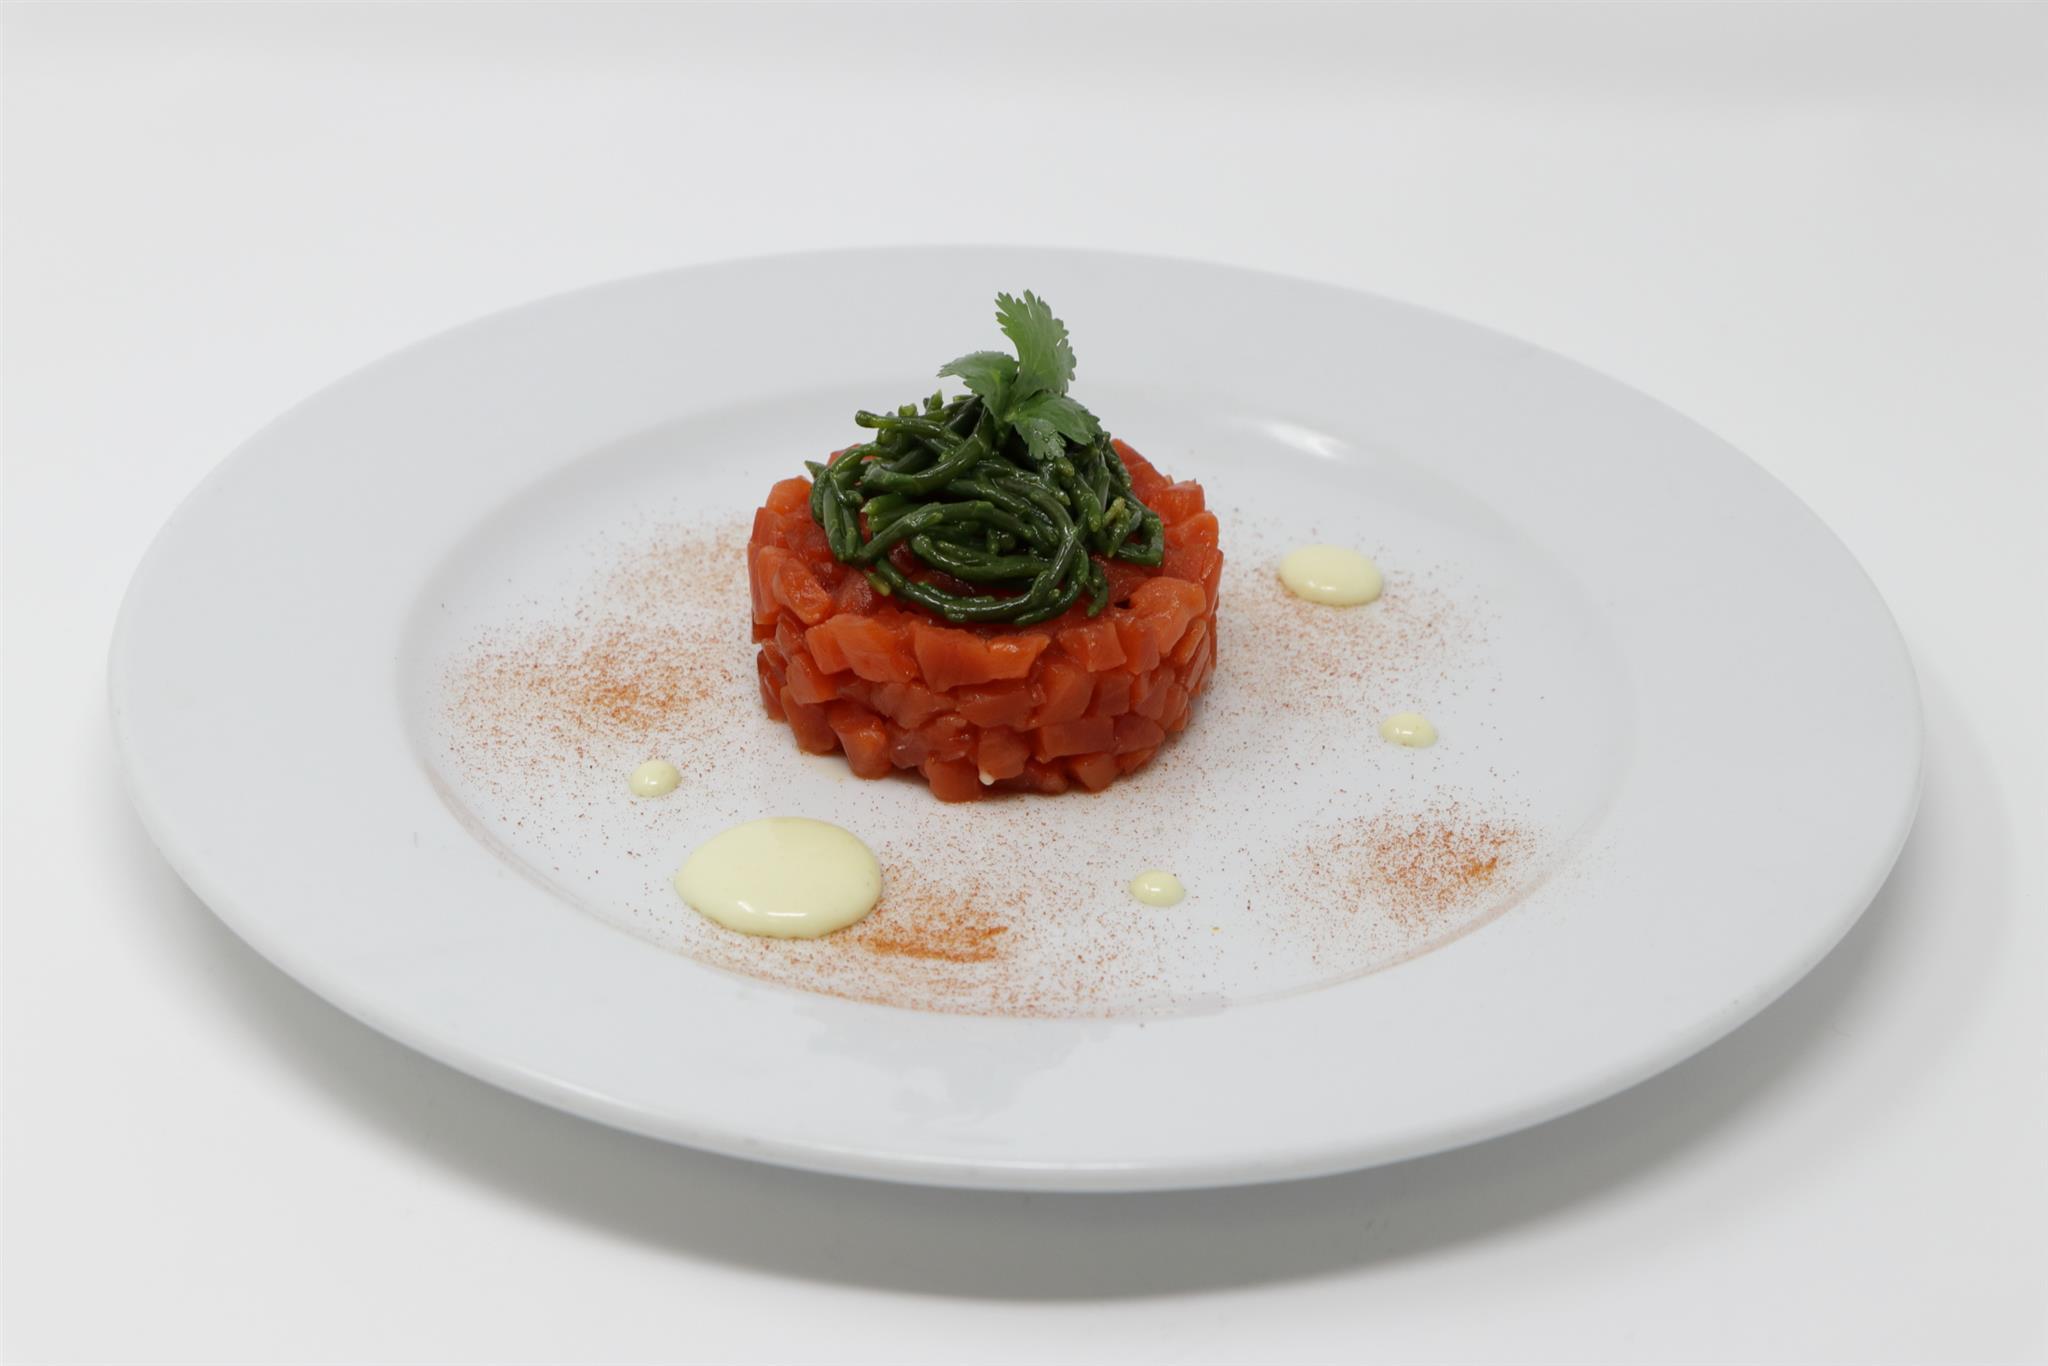 daruma-seasons-chef-barbieri-estate-2018-battuto-salmone